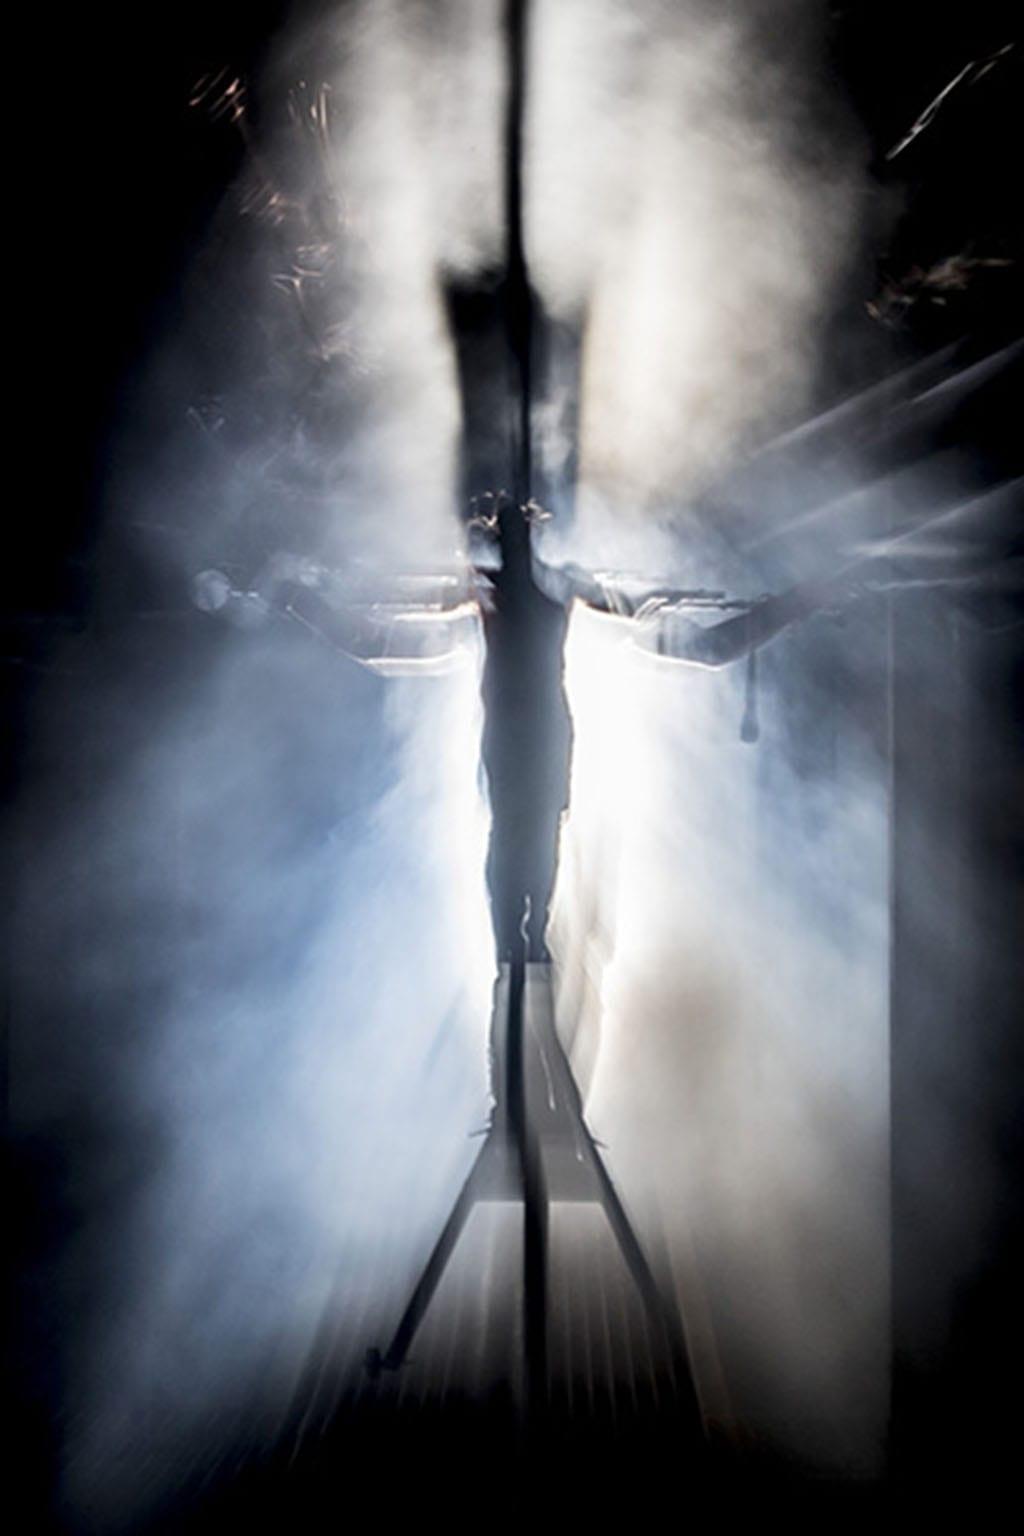 jesus christ superstar plays to see